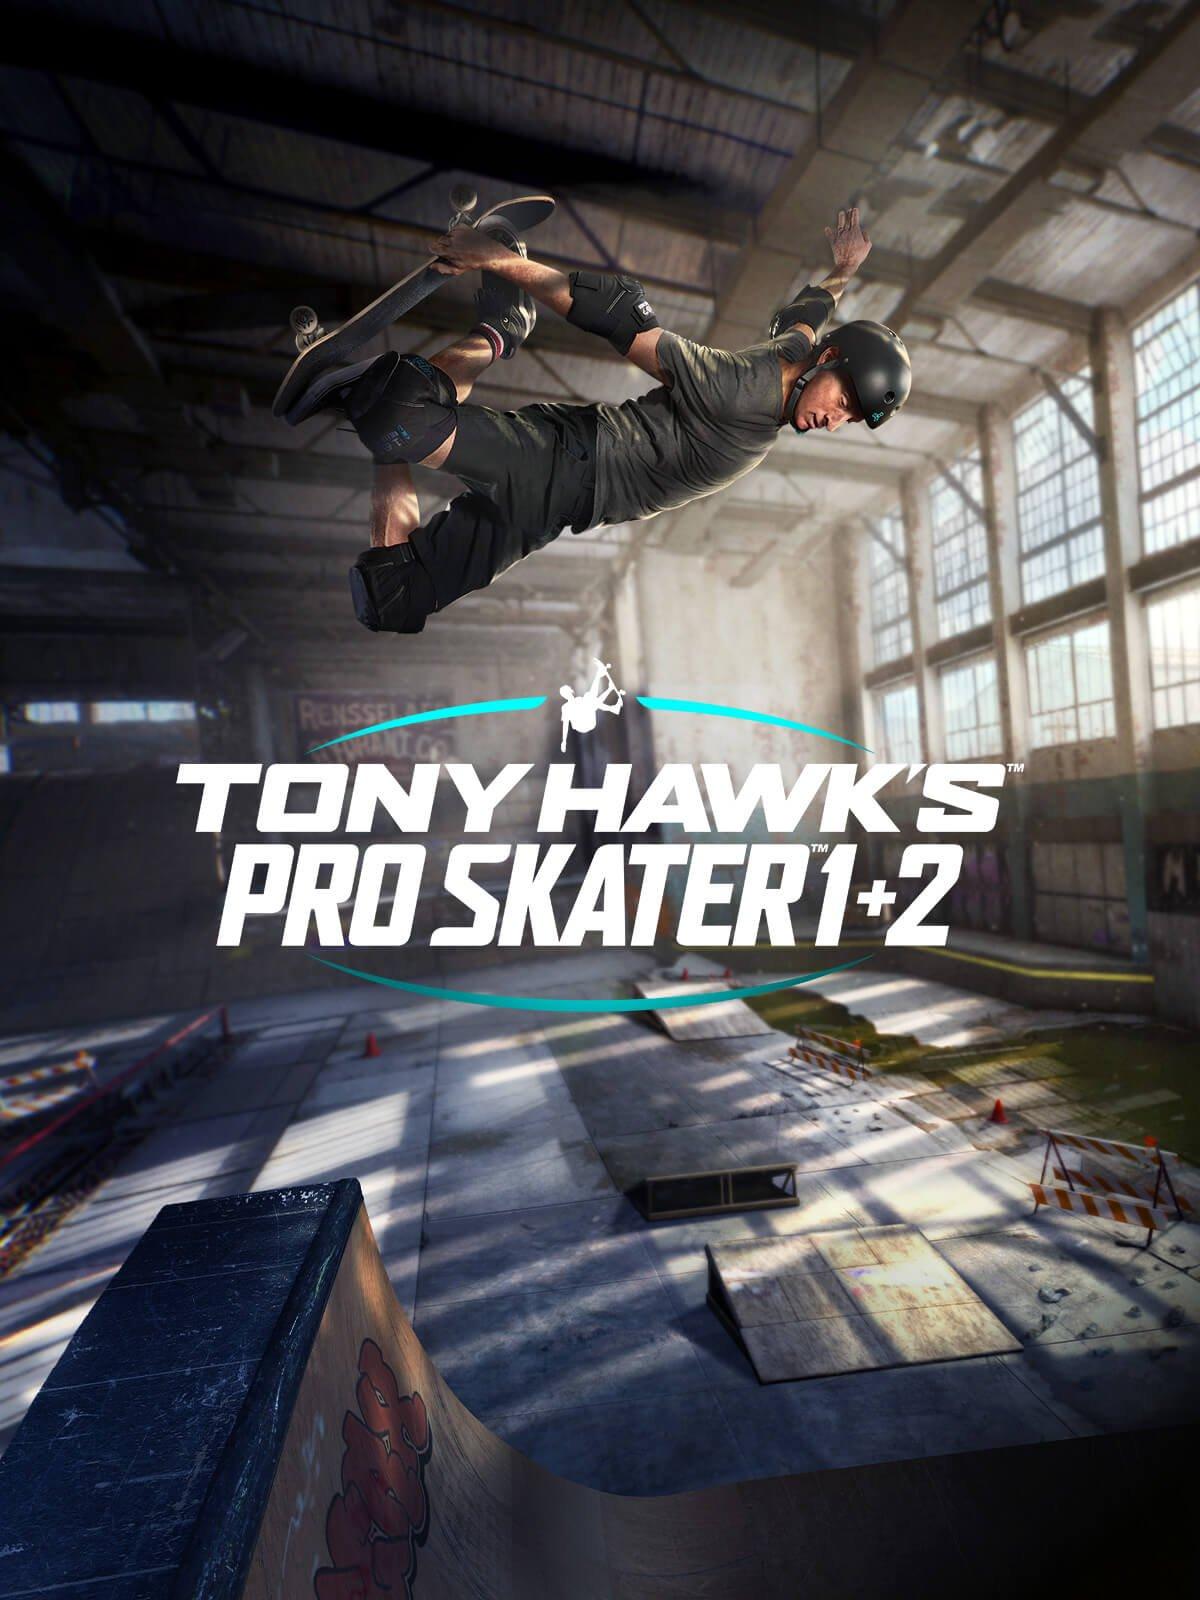 Tony Hawk's Pro Skater 1 + 2 (PS5) Review 2